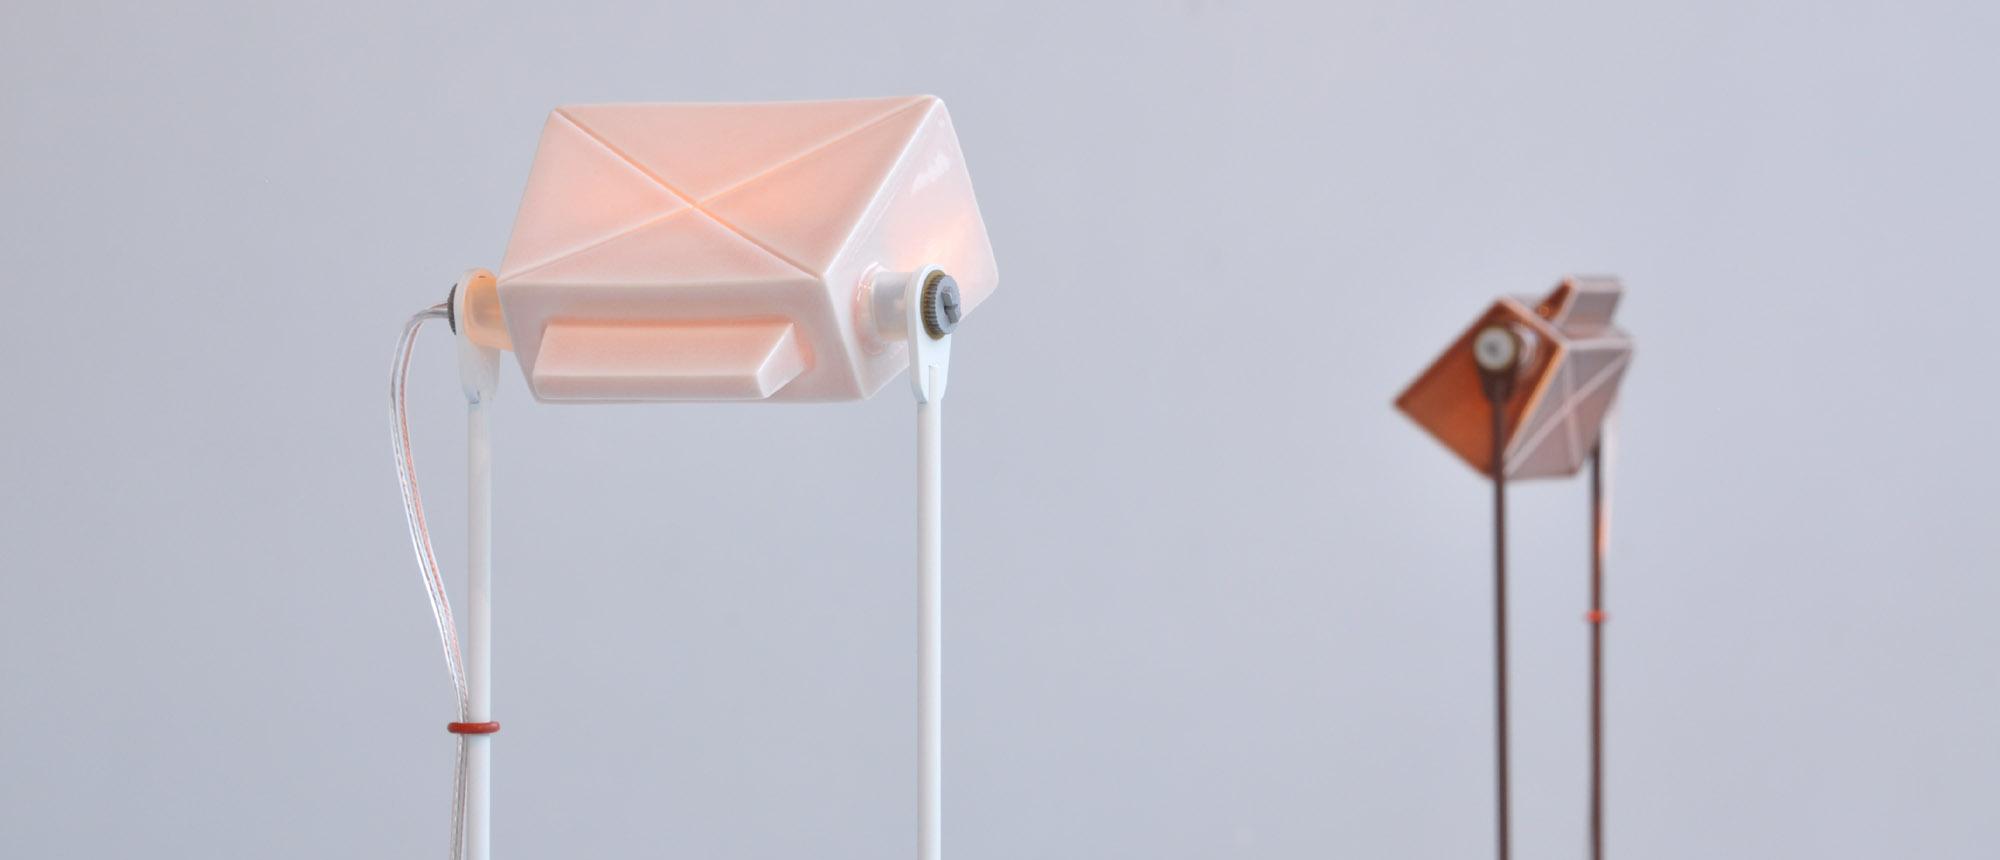 Keramieklampje